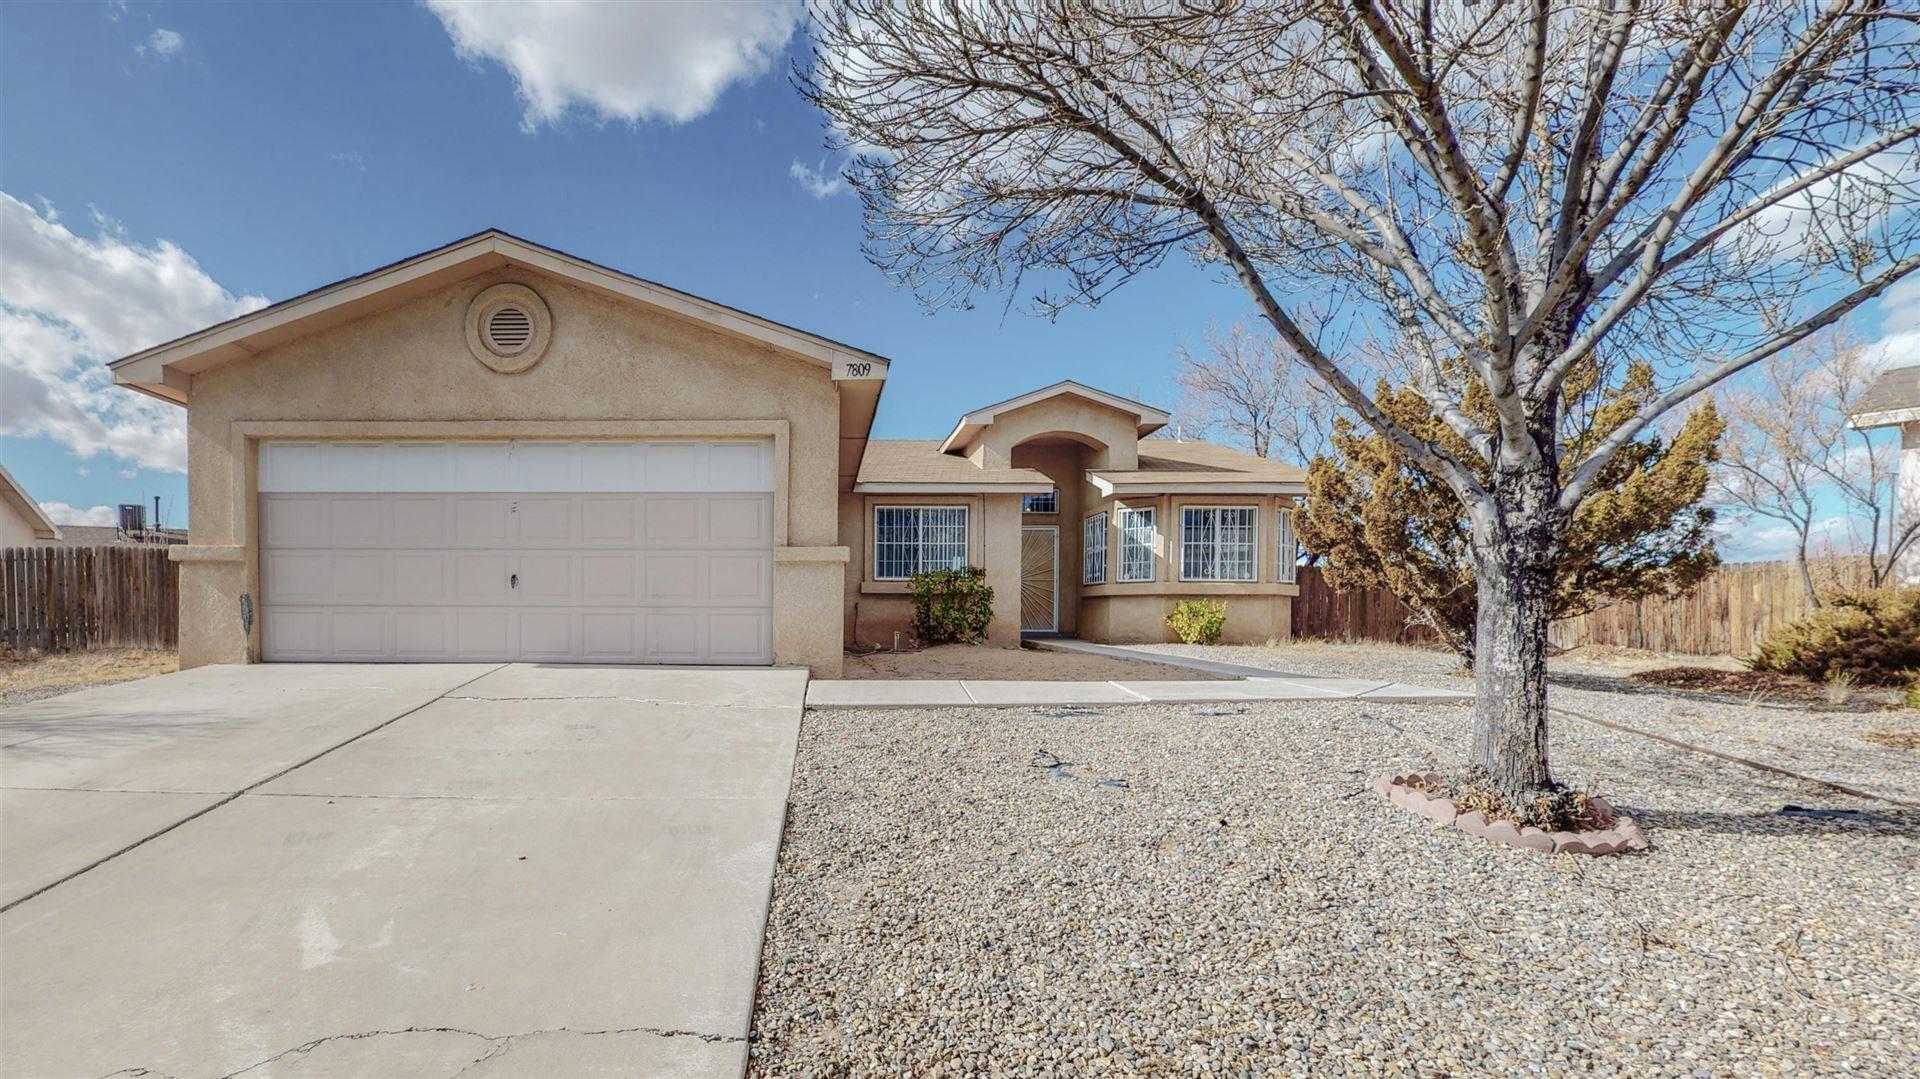 7809 WINDSONG Place SW, Albuquerque, NM 87121 - MLS#: 984312